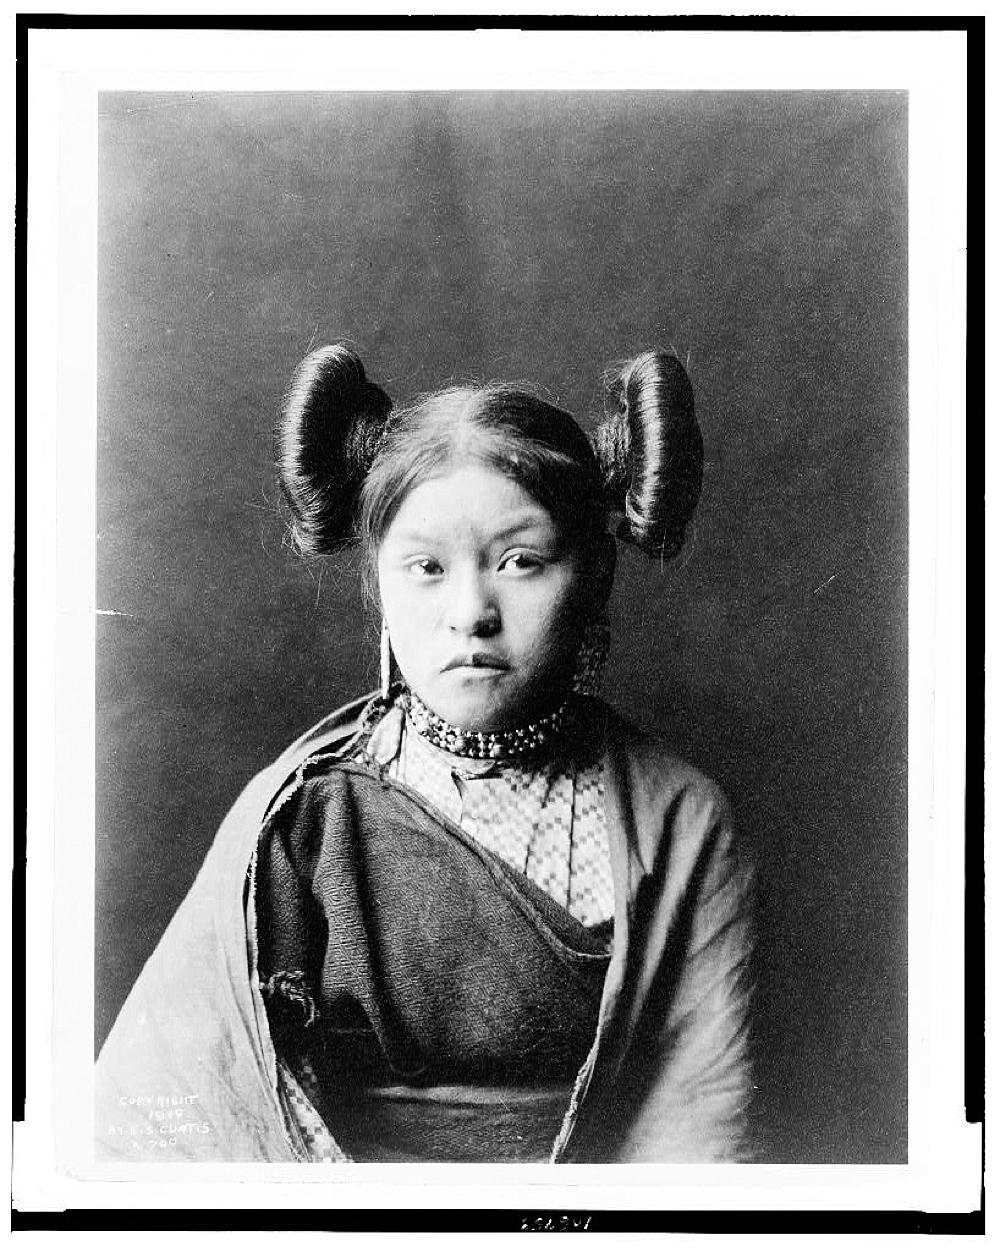 [Gobuguoy, Walpi girl, half-length portrait